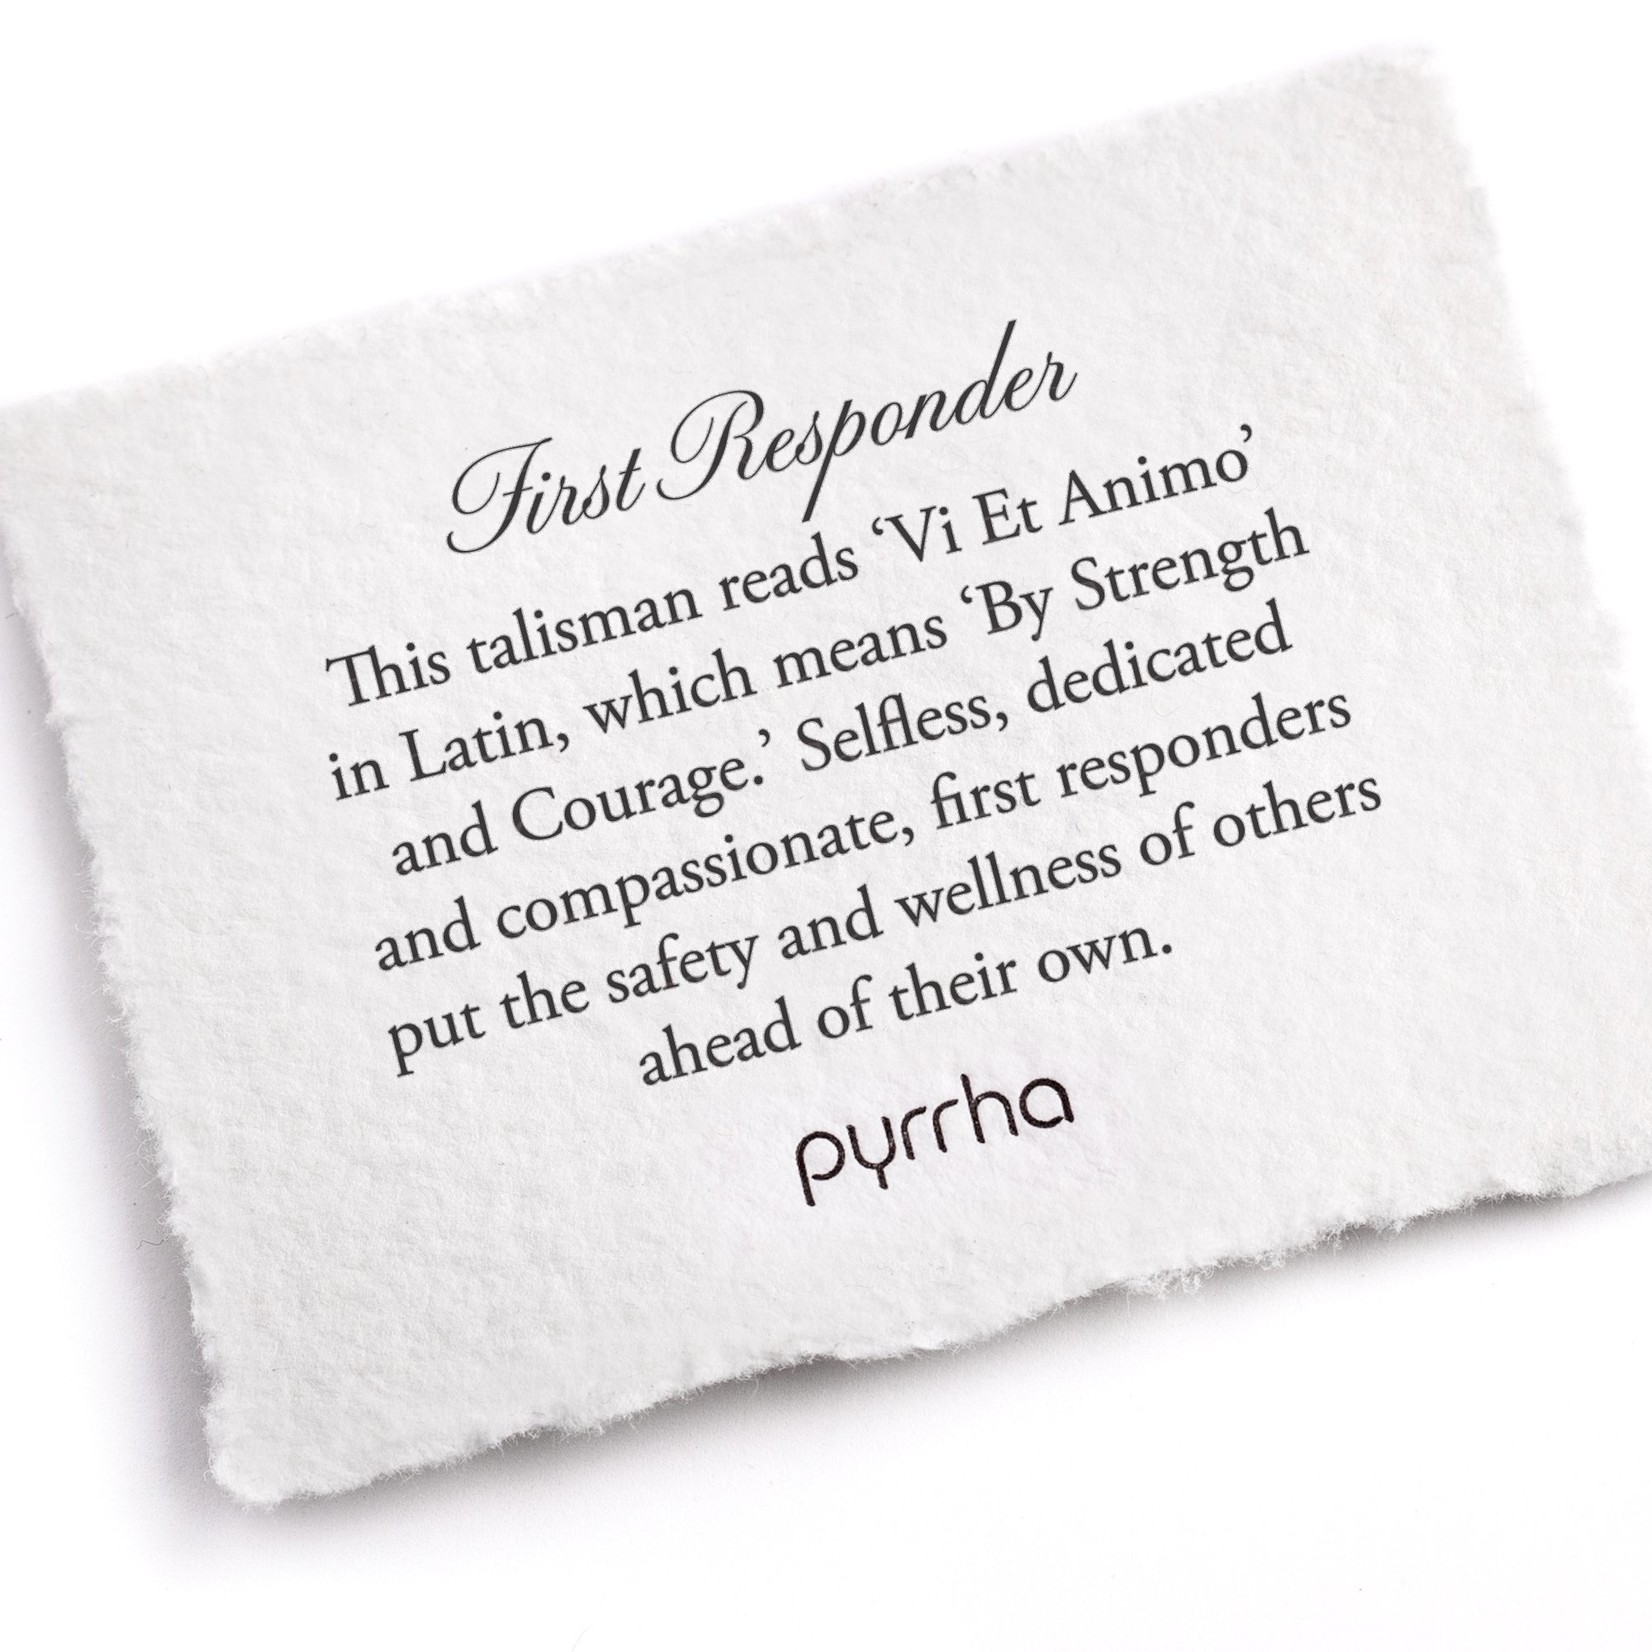 Pyrrha First Responder Signature Talisman